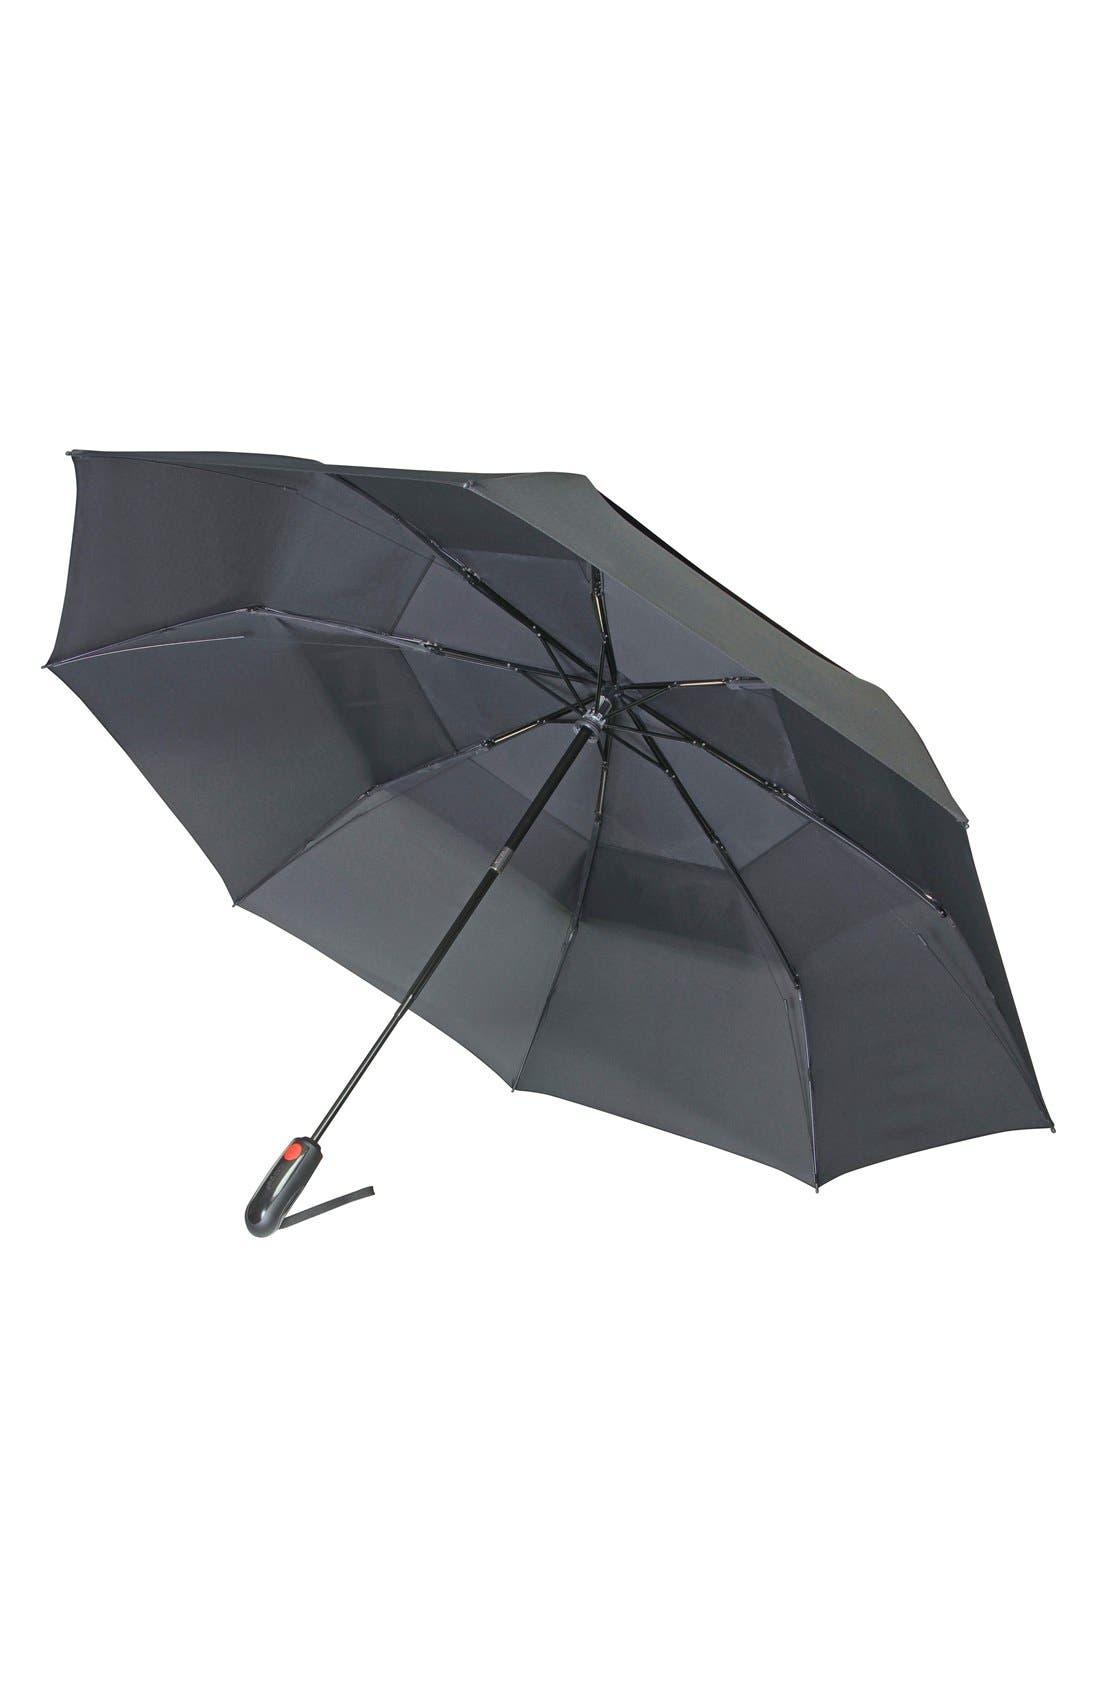 'Xtreme Duomatic' Umbrella,                             Alternate thumbnail 2, color,                             BLACK